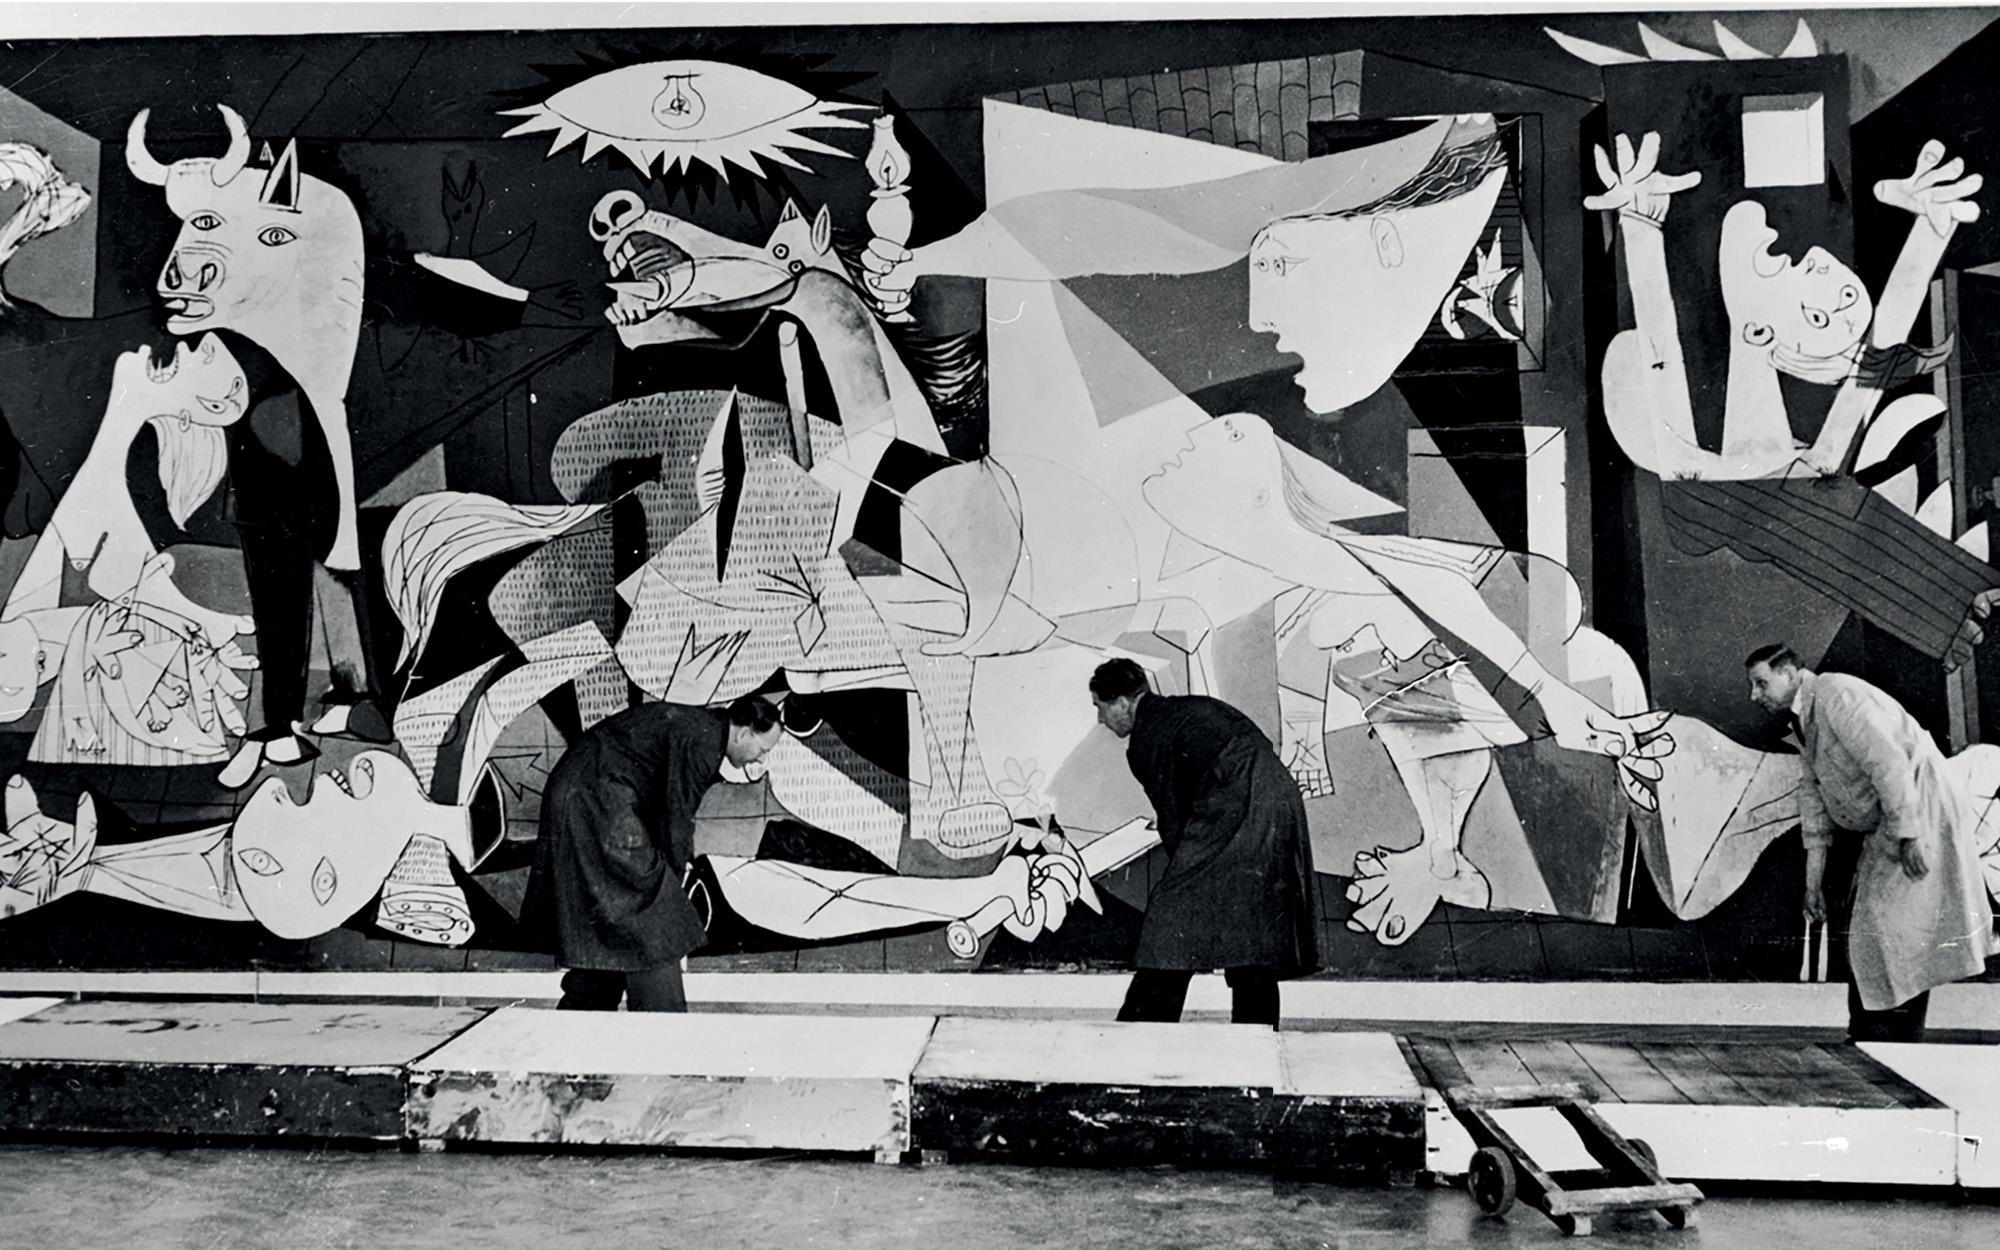 hội họa tác phẩm của Pablo Picasso